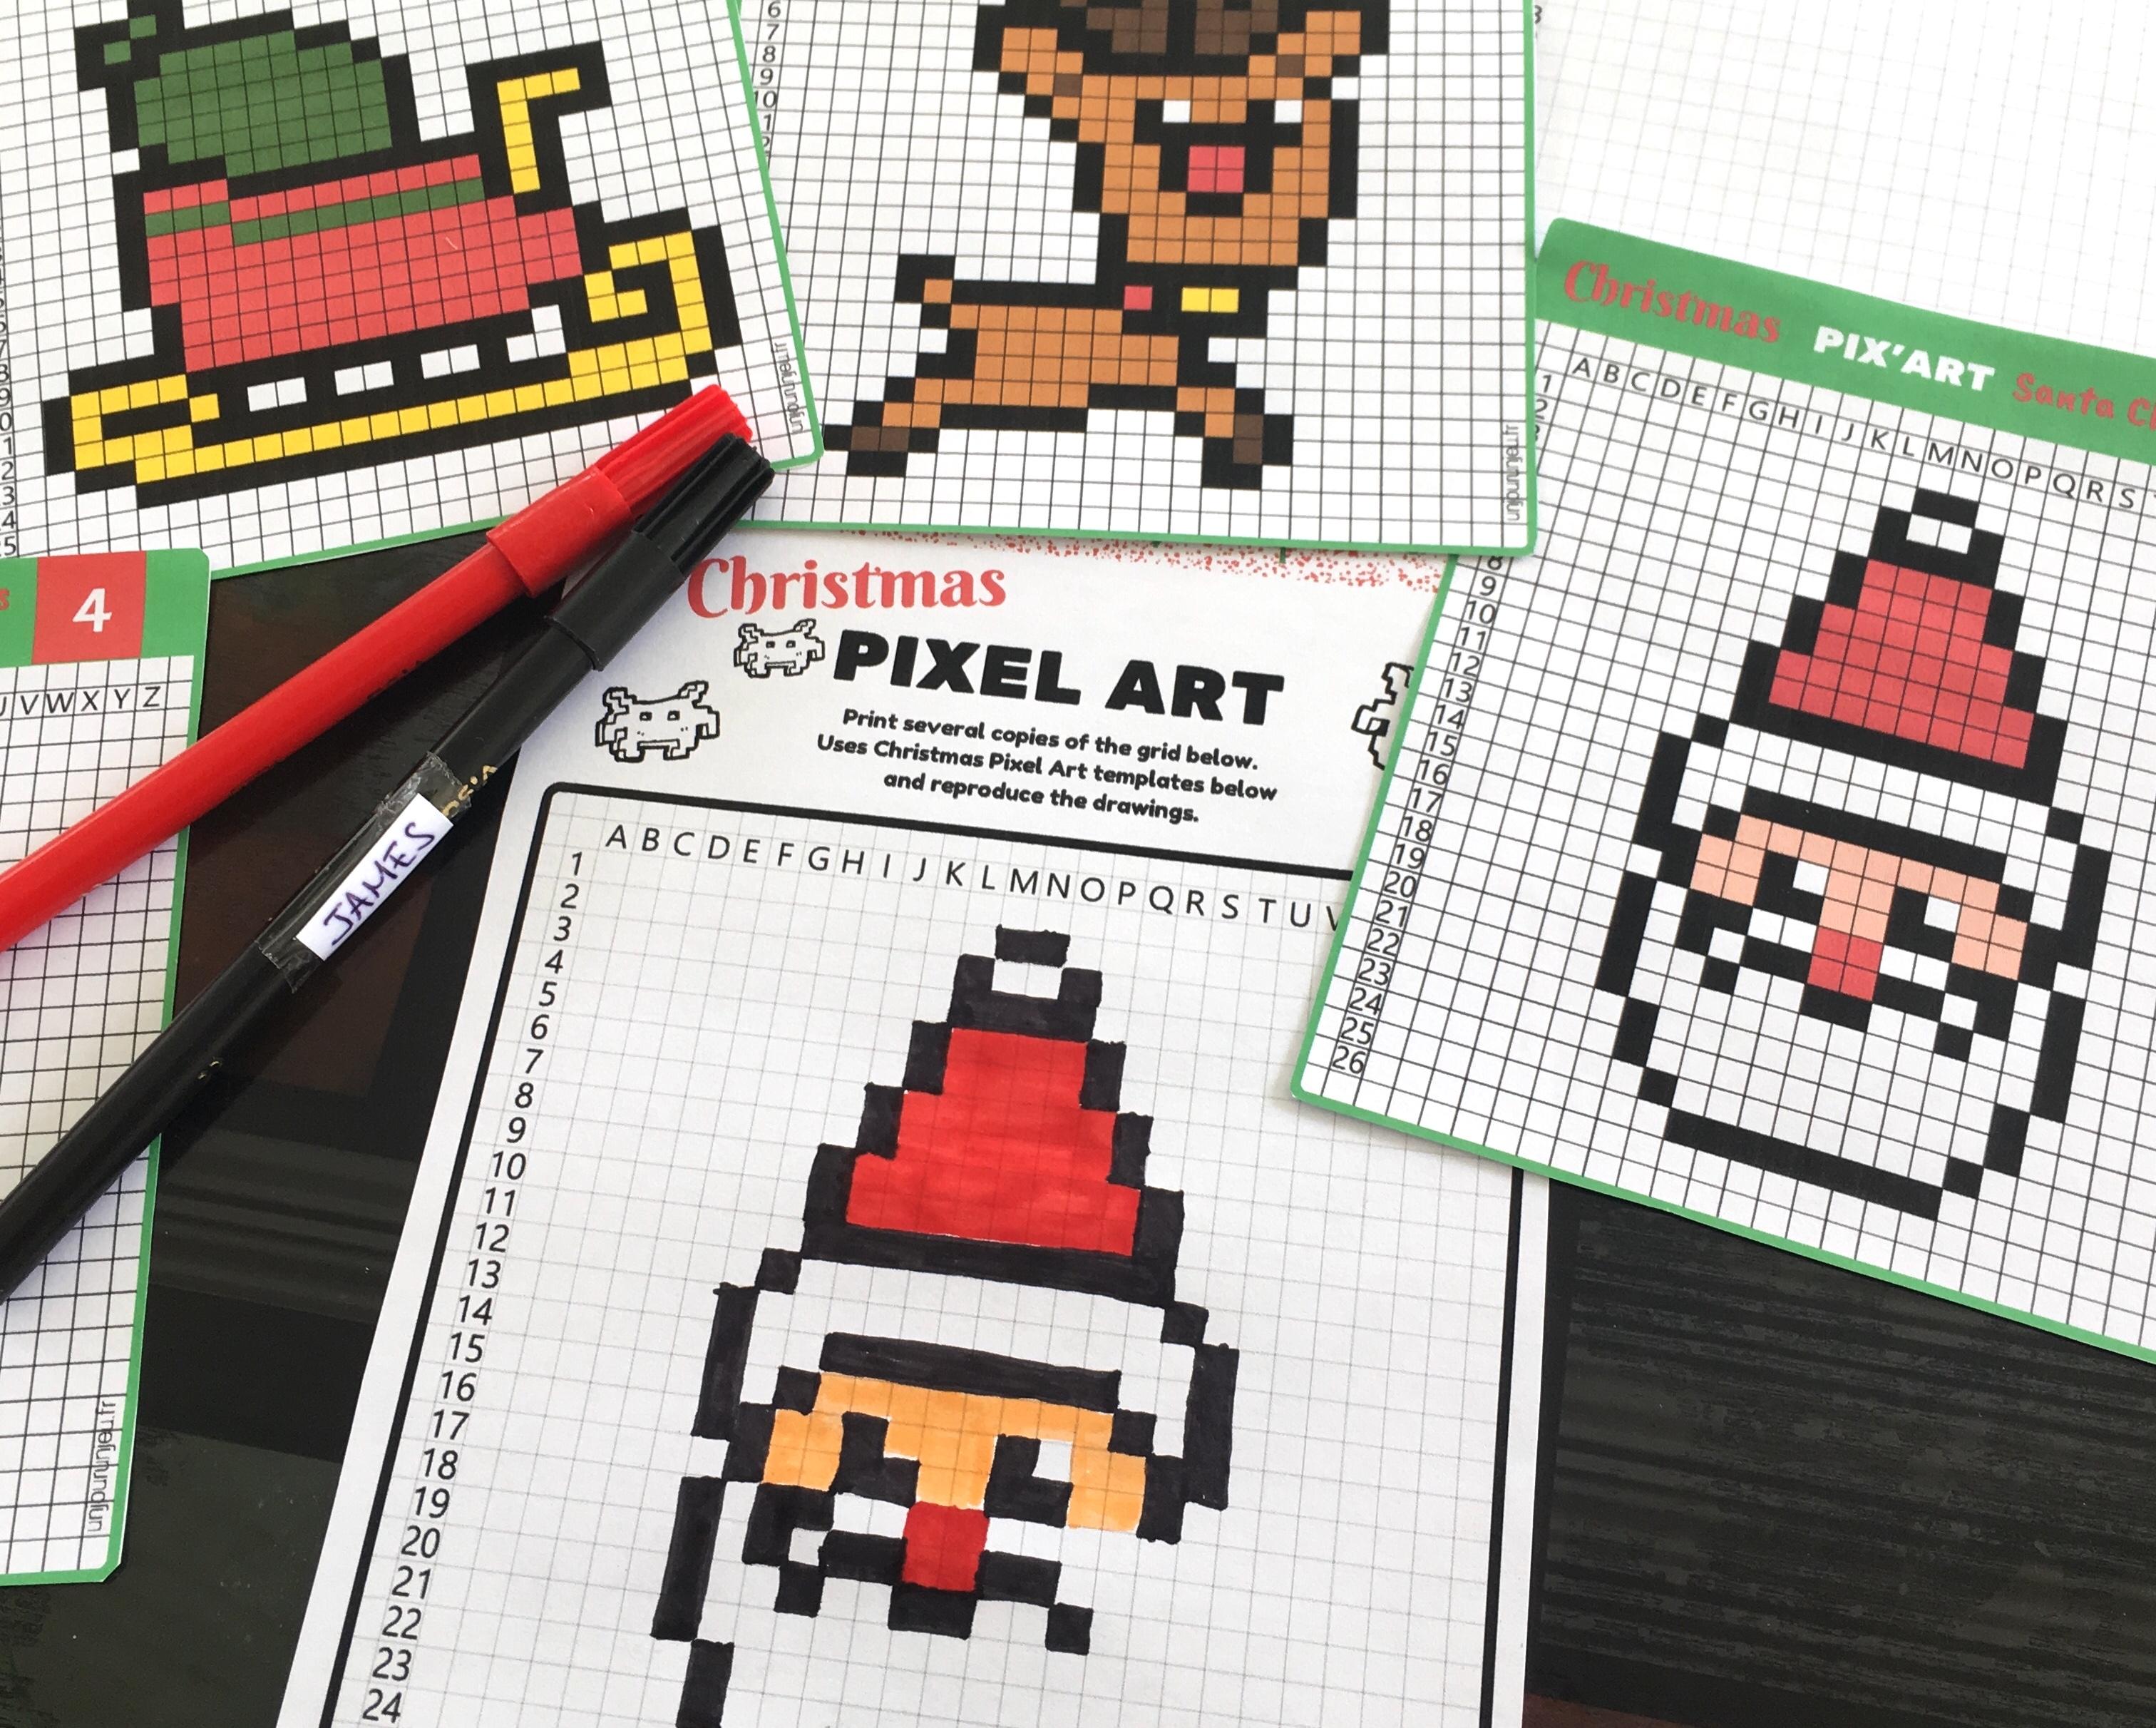 Christmas Pixel Art 12 Templates To Print For Free Kidslife